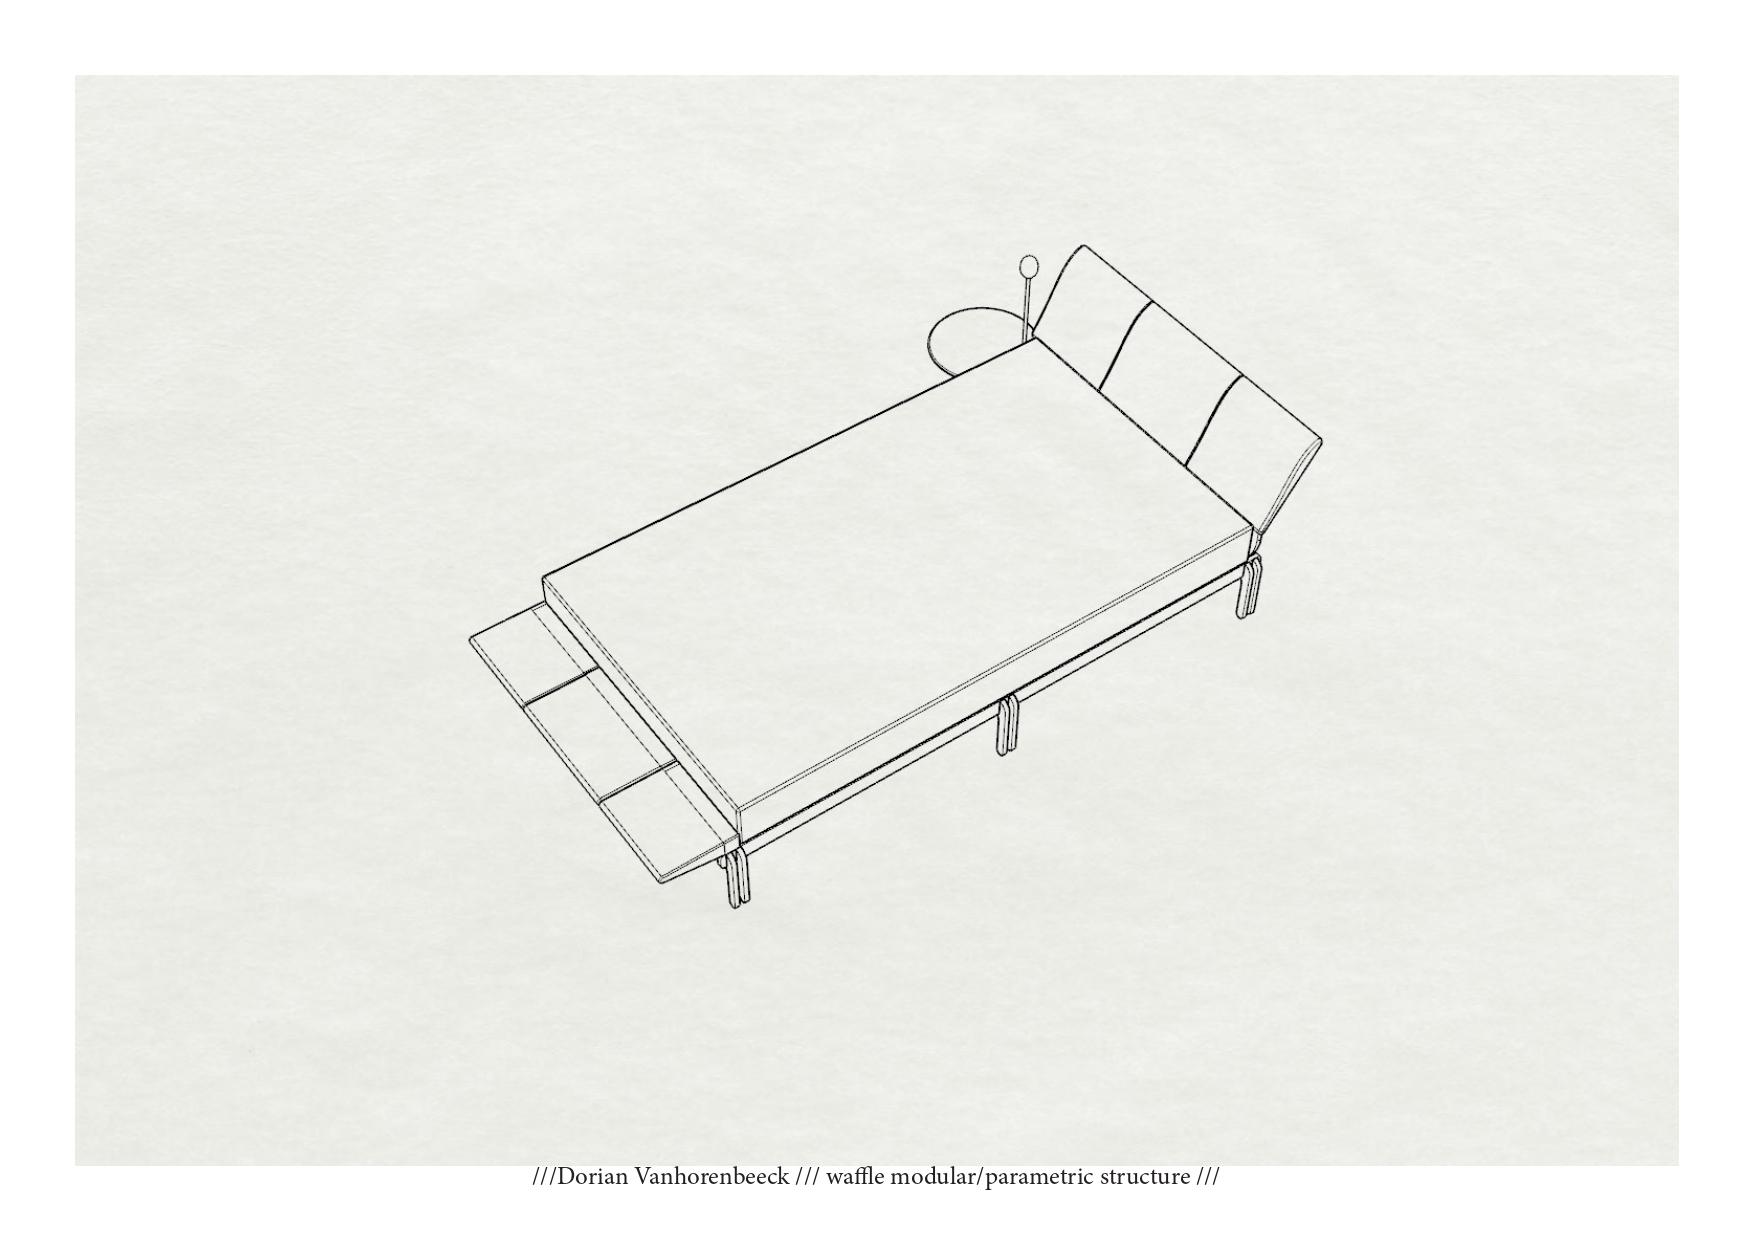 Livret Waffle modular-parametric Structure Dorian Vanhorenbeeck_page-0002